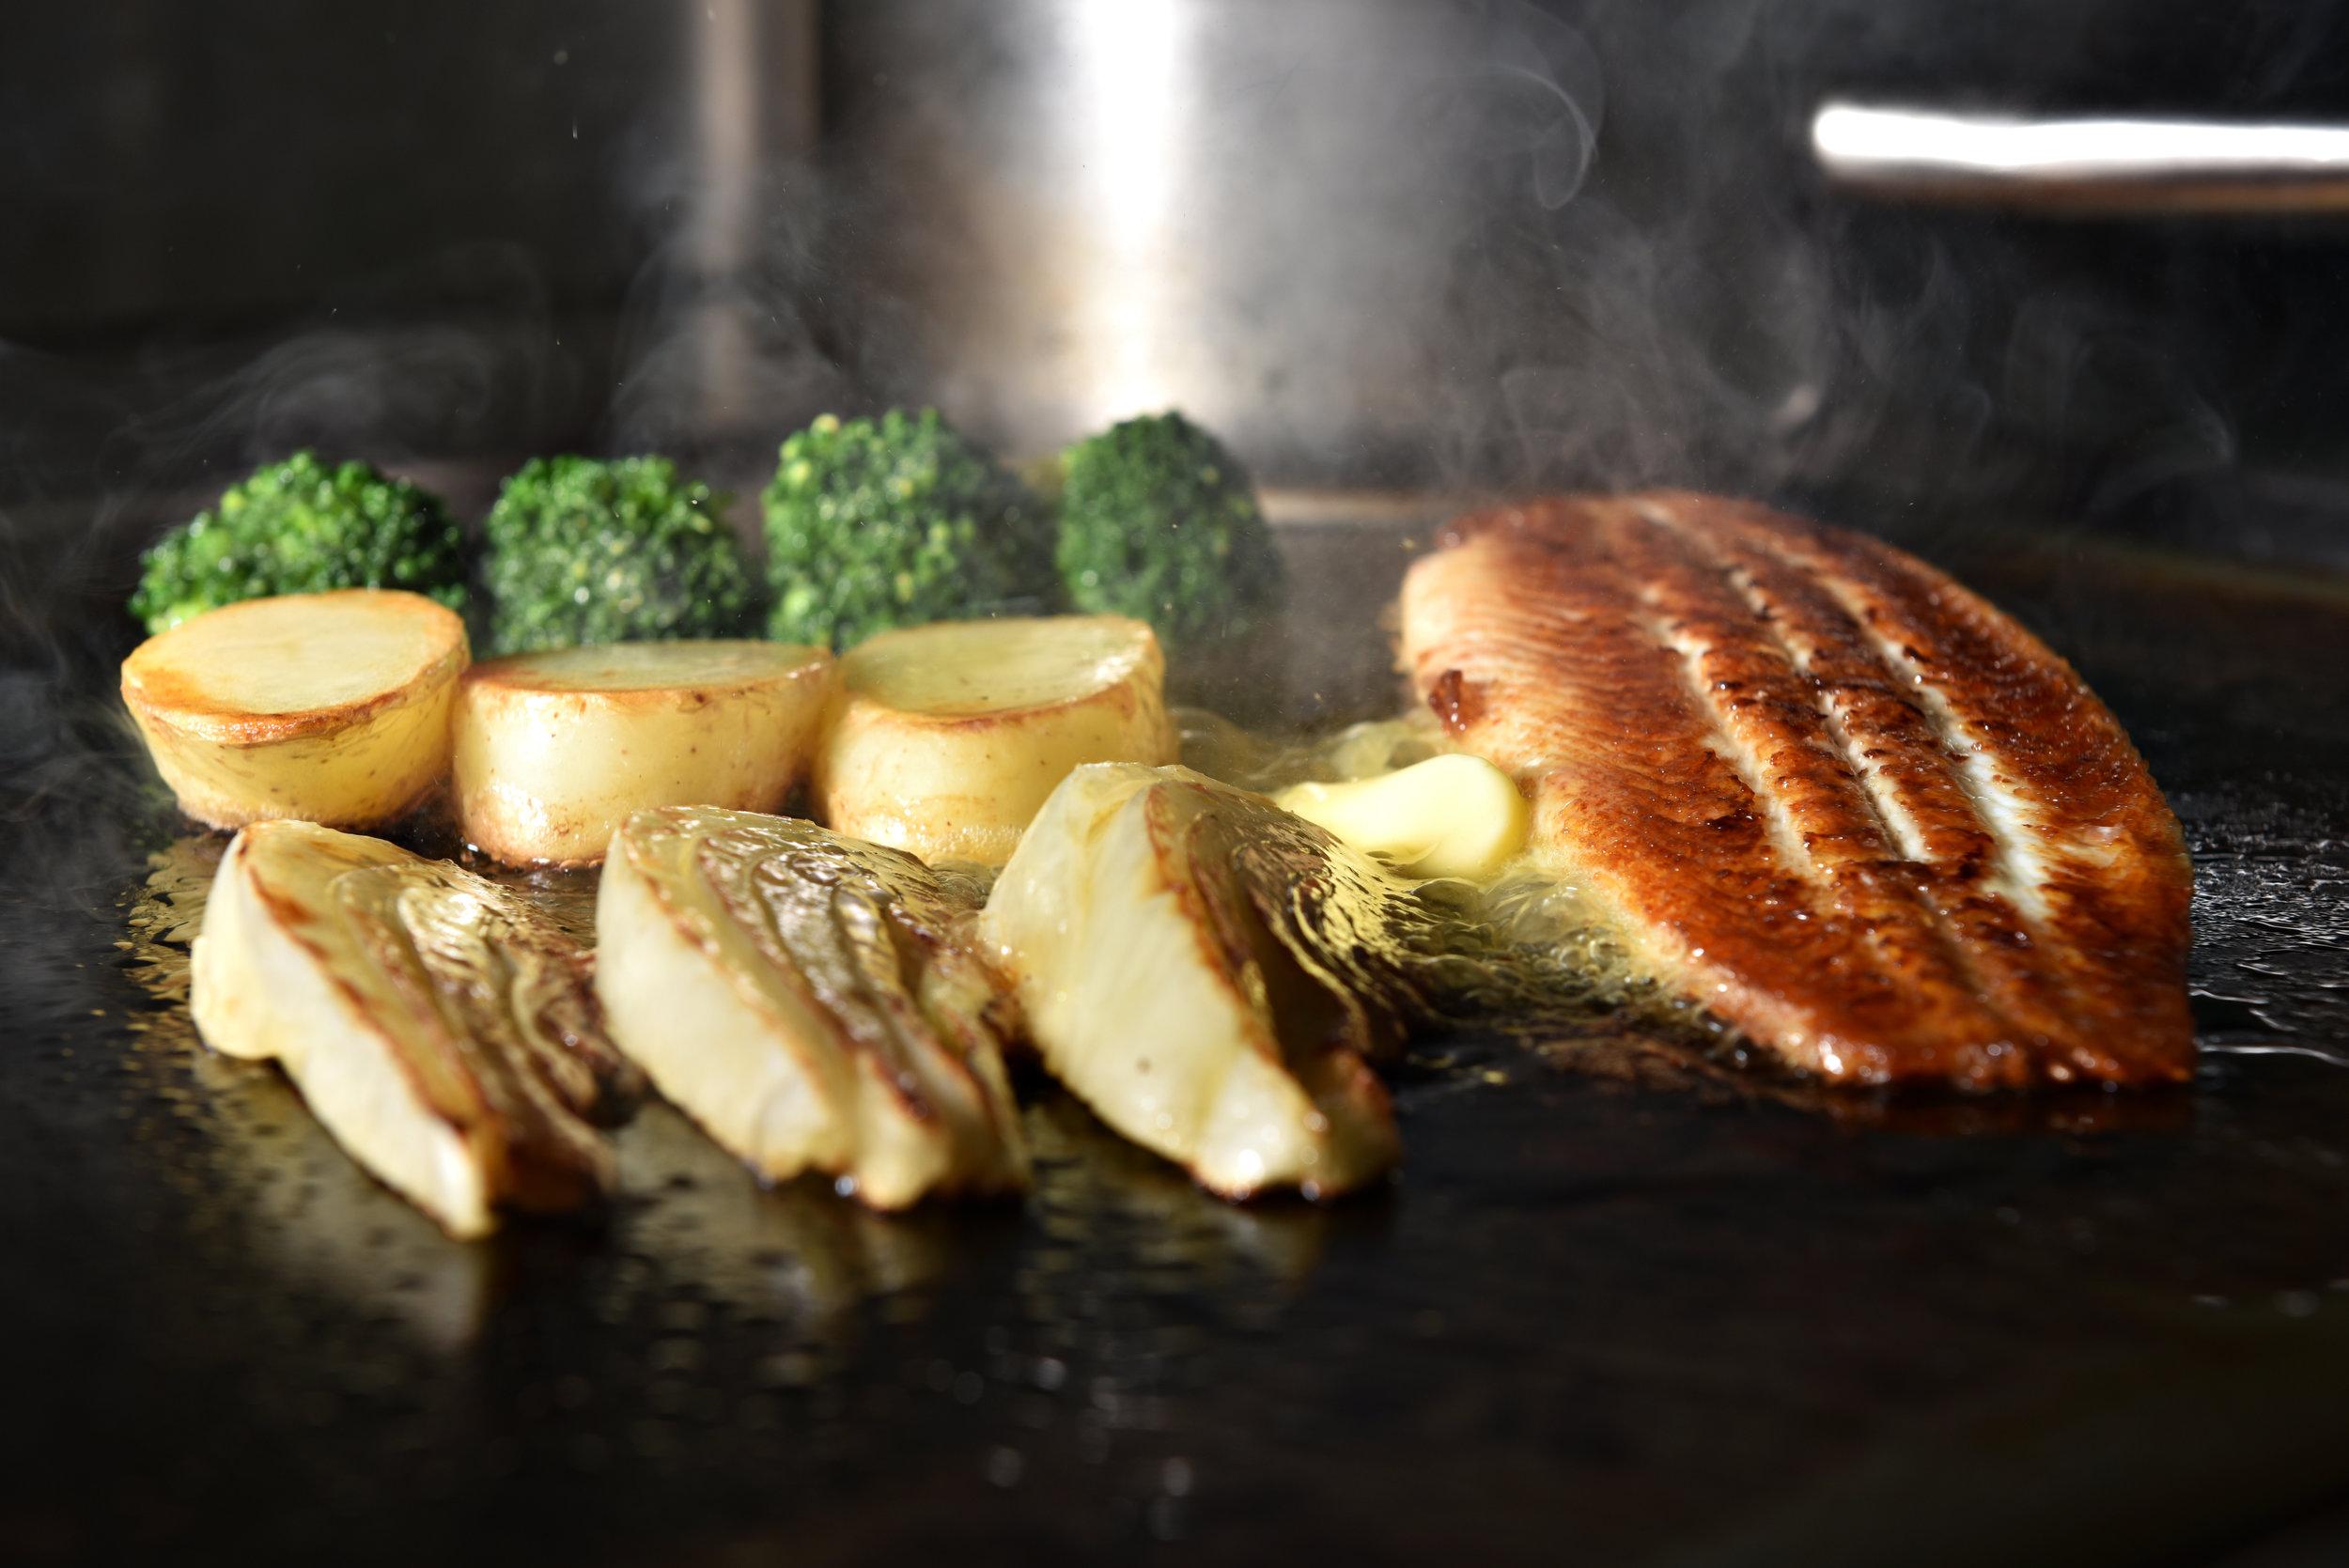 4 dome sur mer seafood schaal schelp kreeft restaurant bistro antwerpen frederic chabbert michelinstar bart albrecht tablefever.jpg